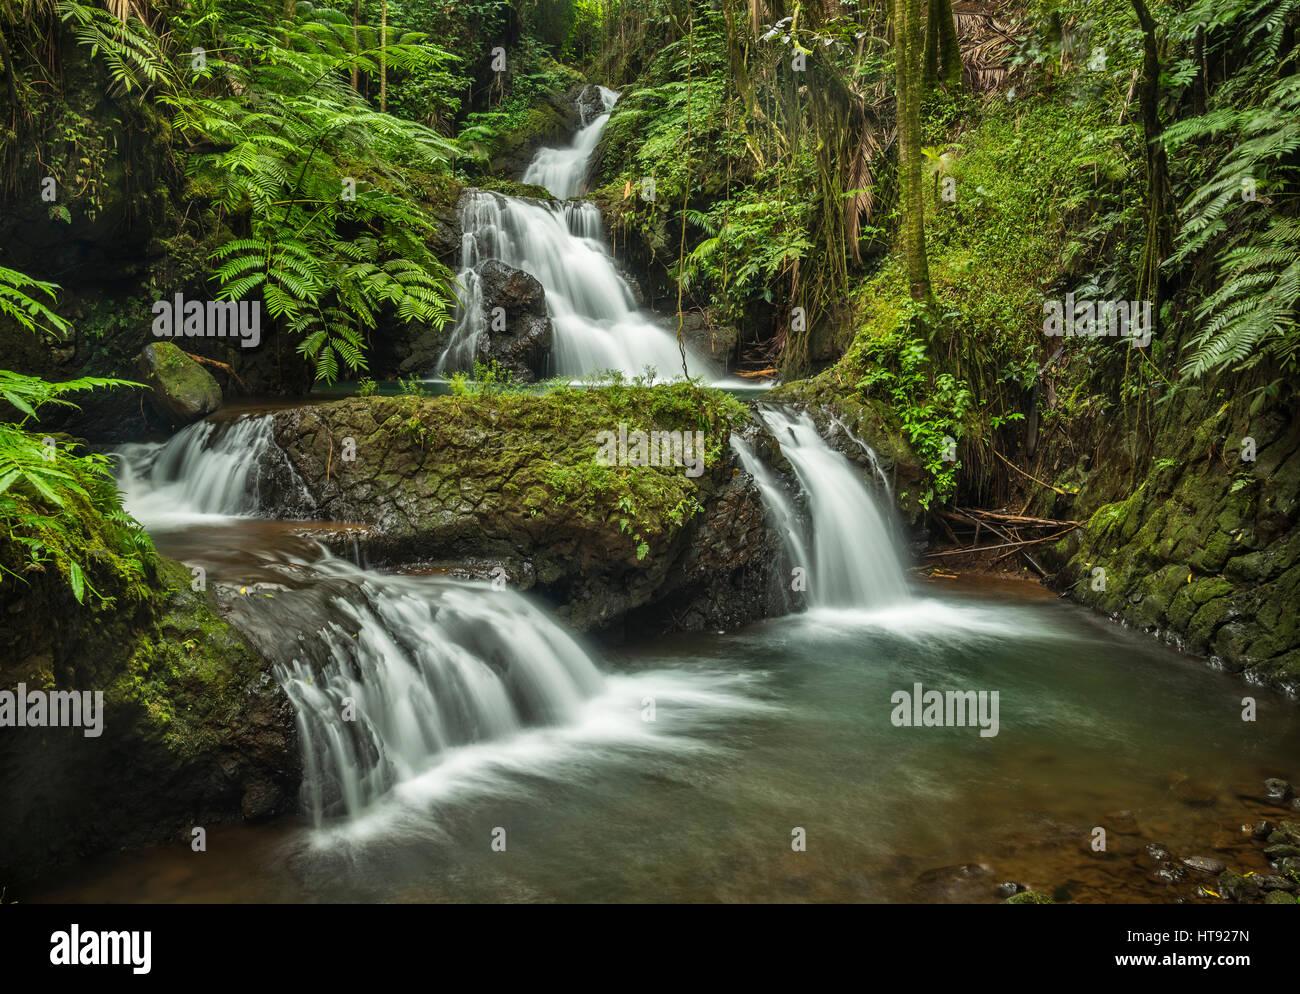 Waterfalls on Onomea Stream in Hawaii Tropical Botanical Garden near Hilo on the Big Island of Hawaii. - Stock Image